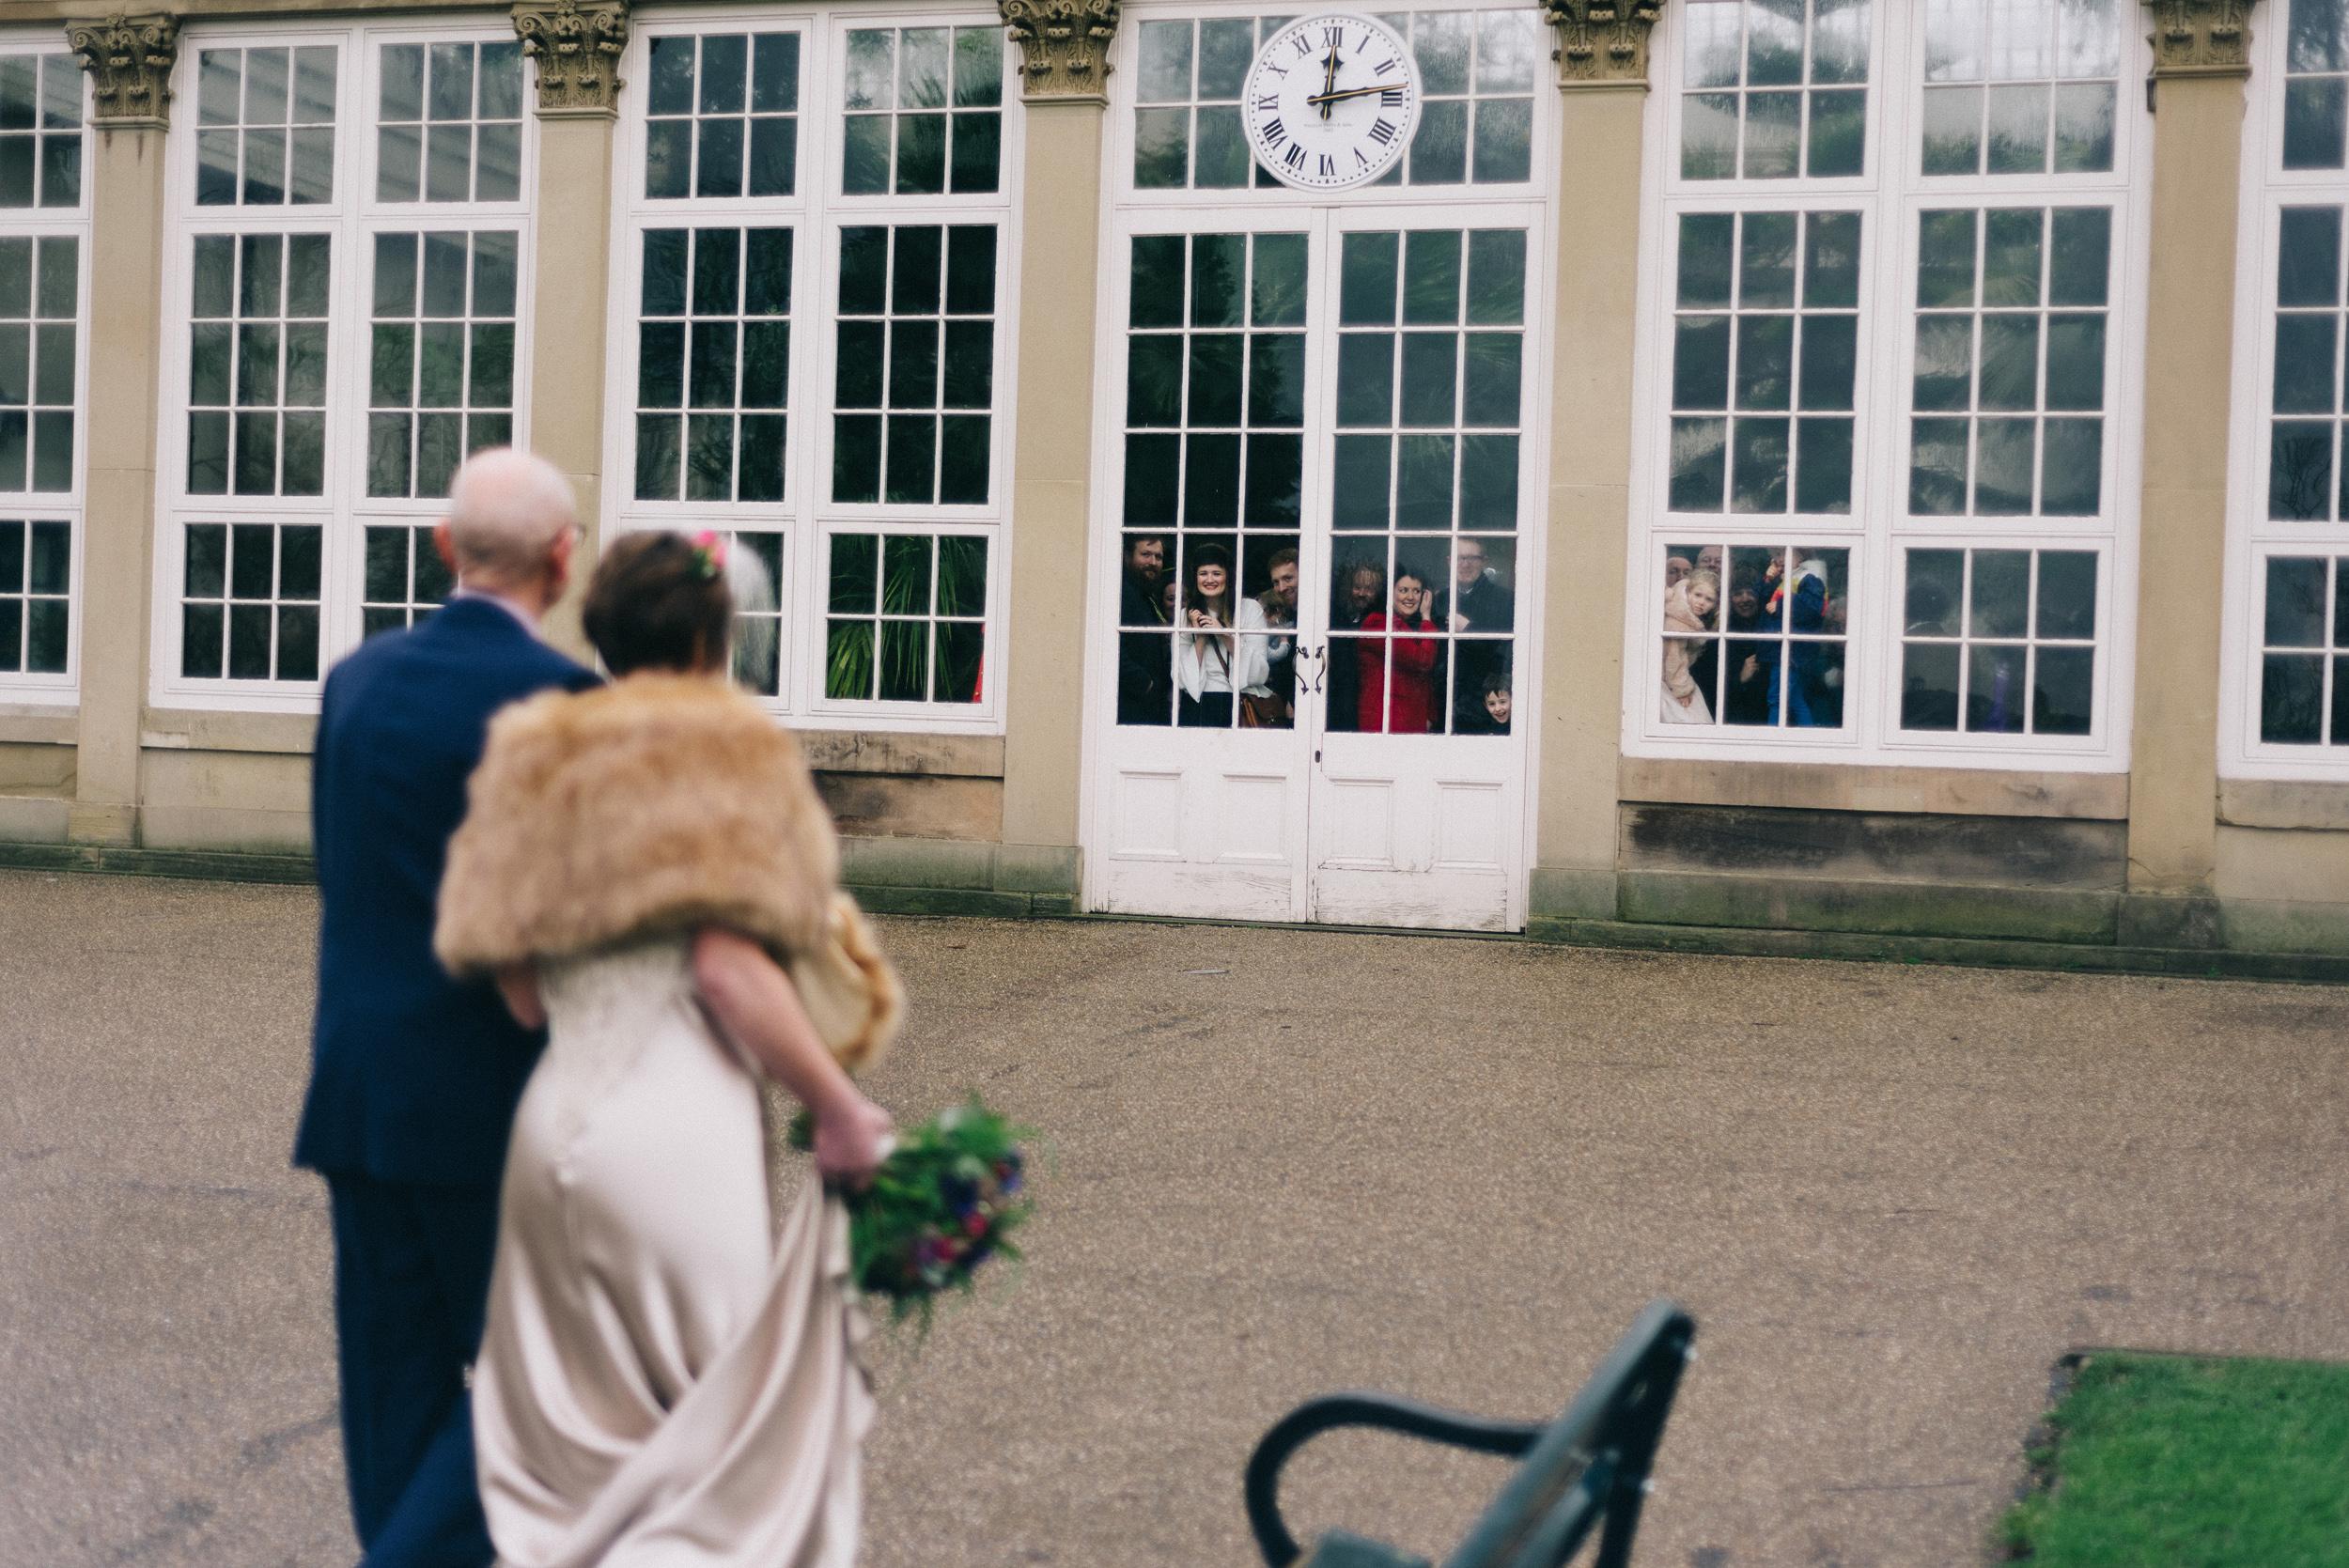 Alice-Bias-Cut-Silk-Wedding-Dress-Kate-Beaumont-Sheffield-Botanical-Gardens-by-Peakography-8.jpg